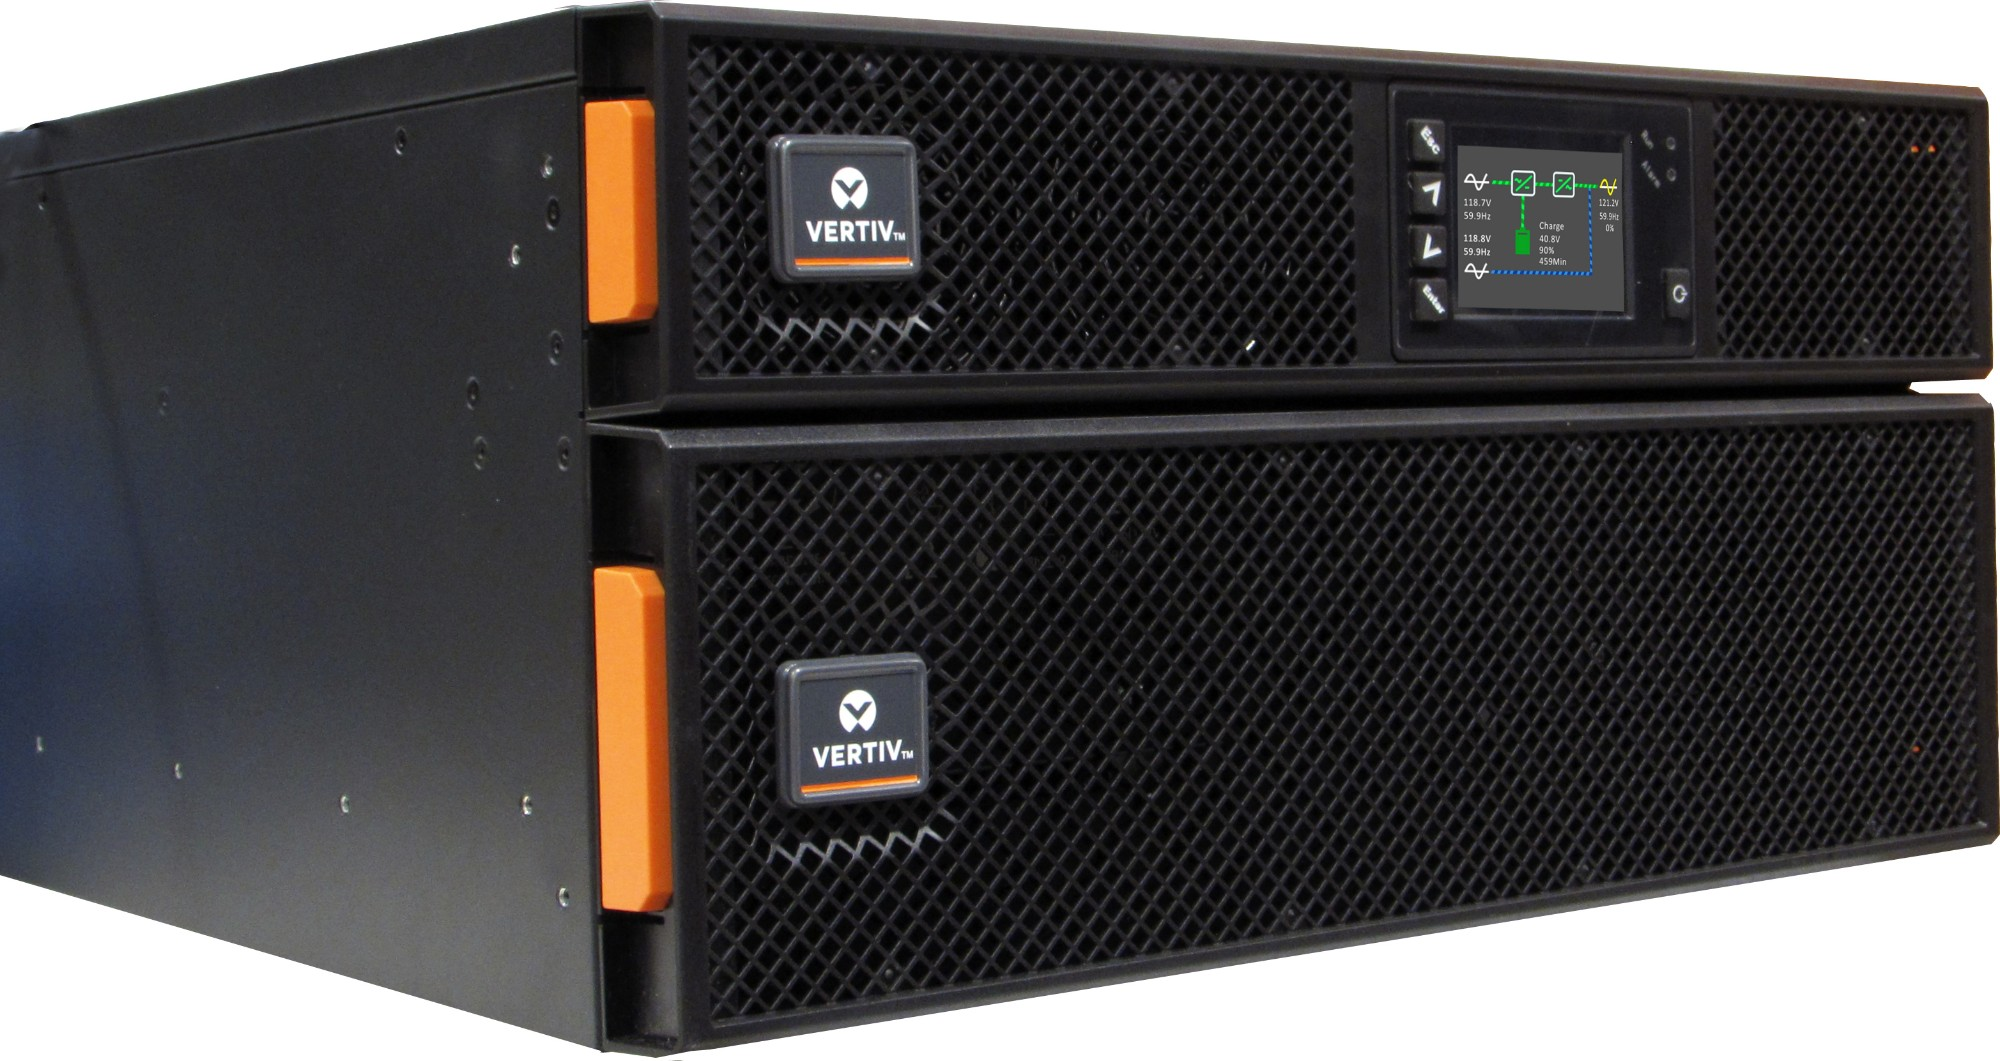 Vertiv Liebert GXT5-5000IRT5UXLE sistema de alimentación ininterrumpida (UPS) Doble conversión (en línea) 5000 VA 5000 W 8 salidas AC